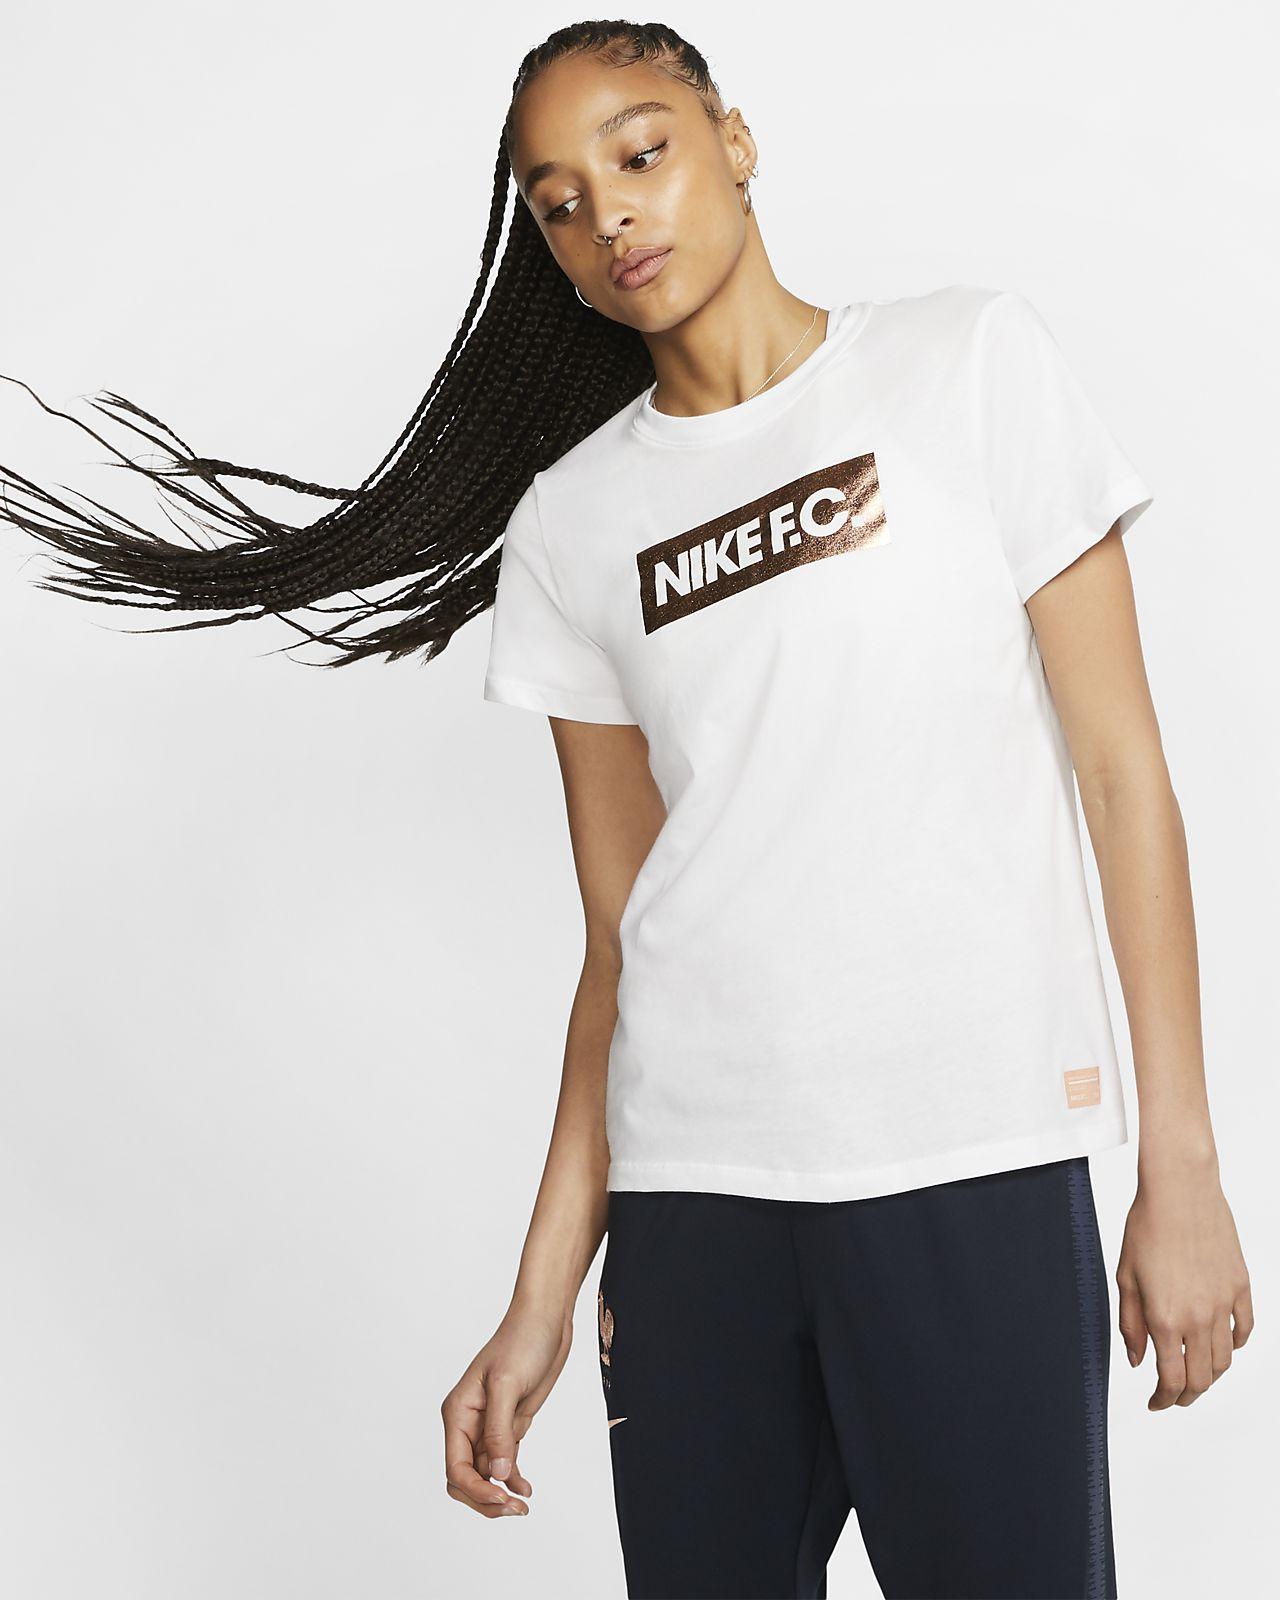 Nike F.C. Samarreta de futbol - Dona